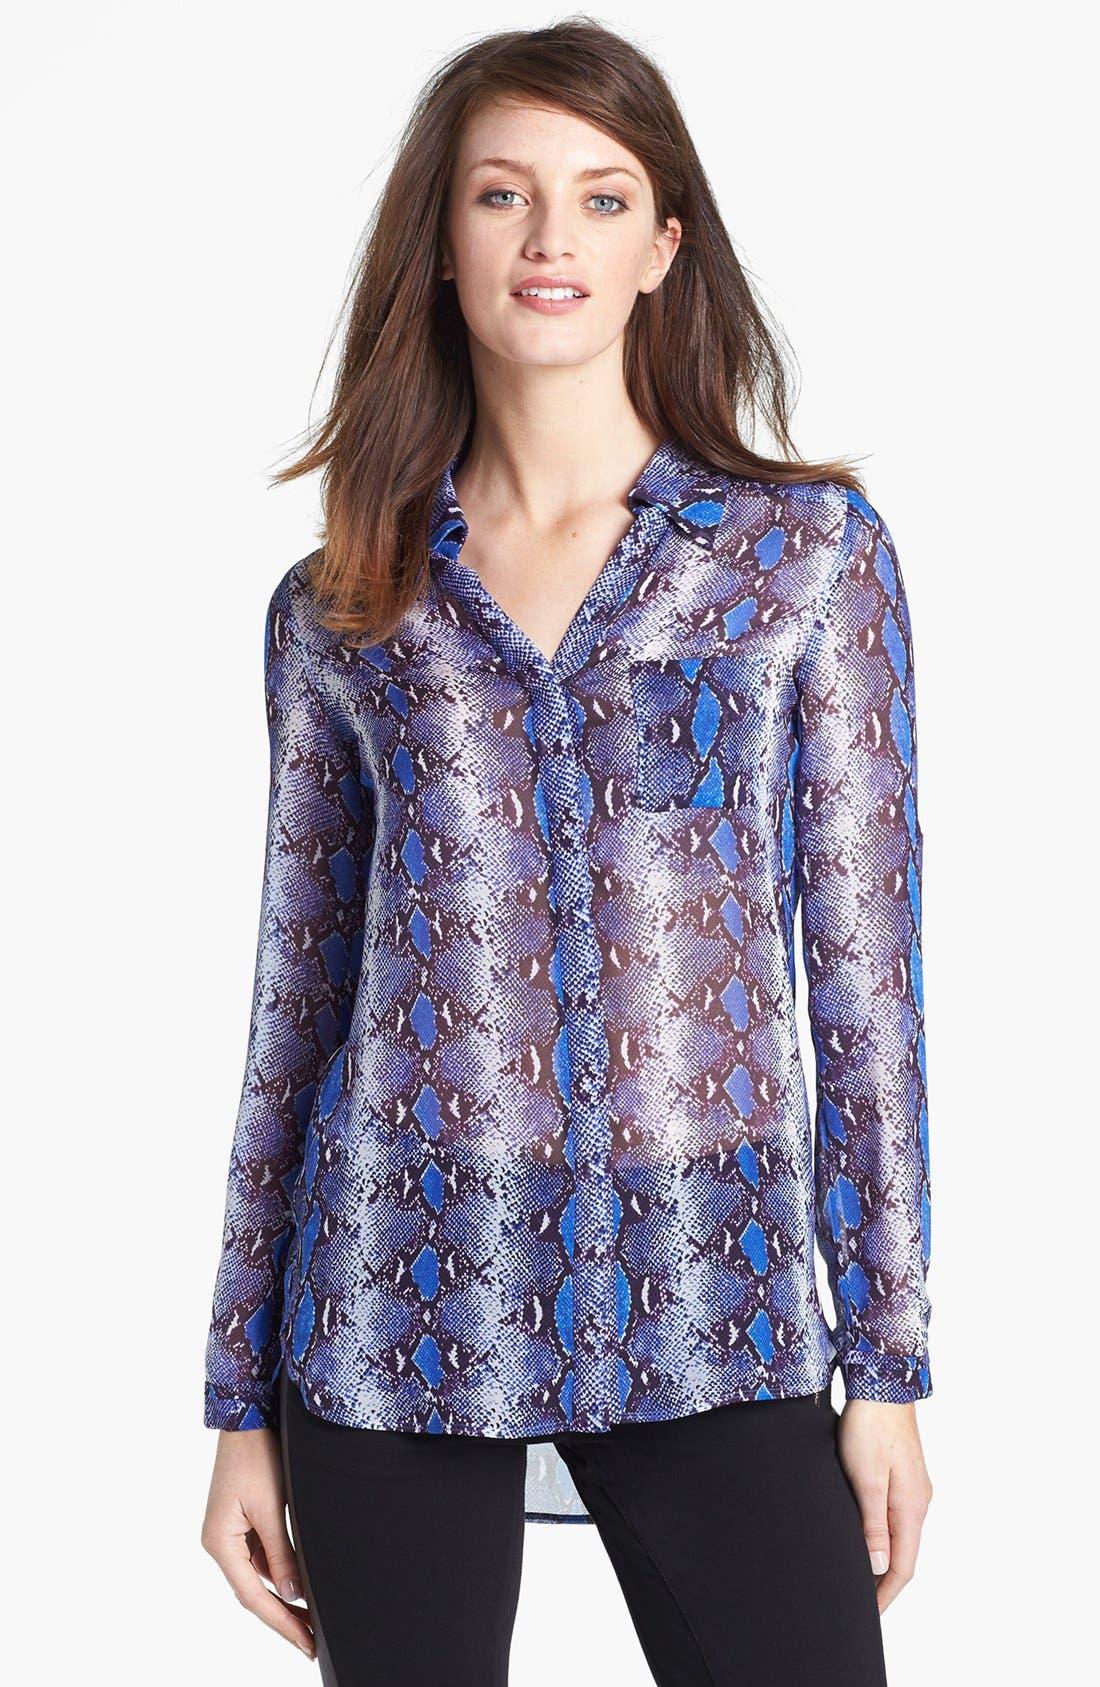 Alternate Image 1 Selected - Diane von Furstenberg 'Lorelei' Print Silk Shirt